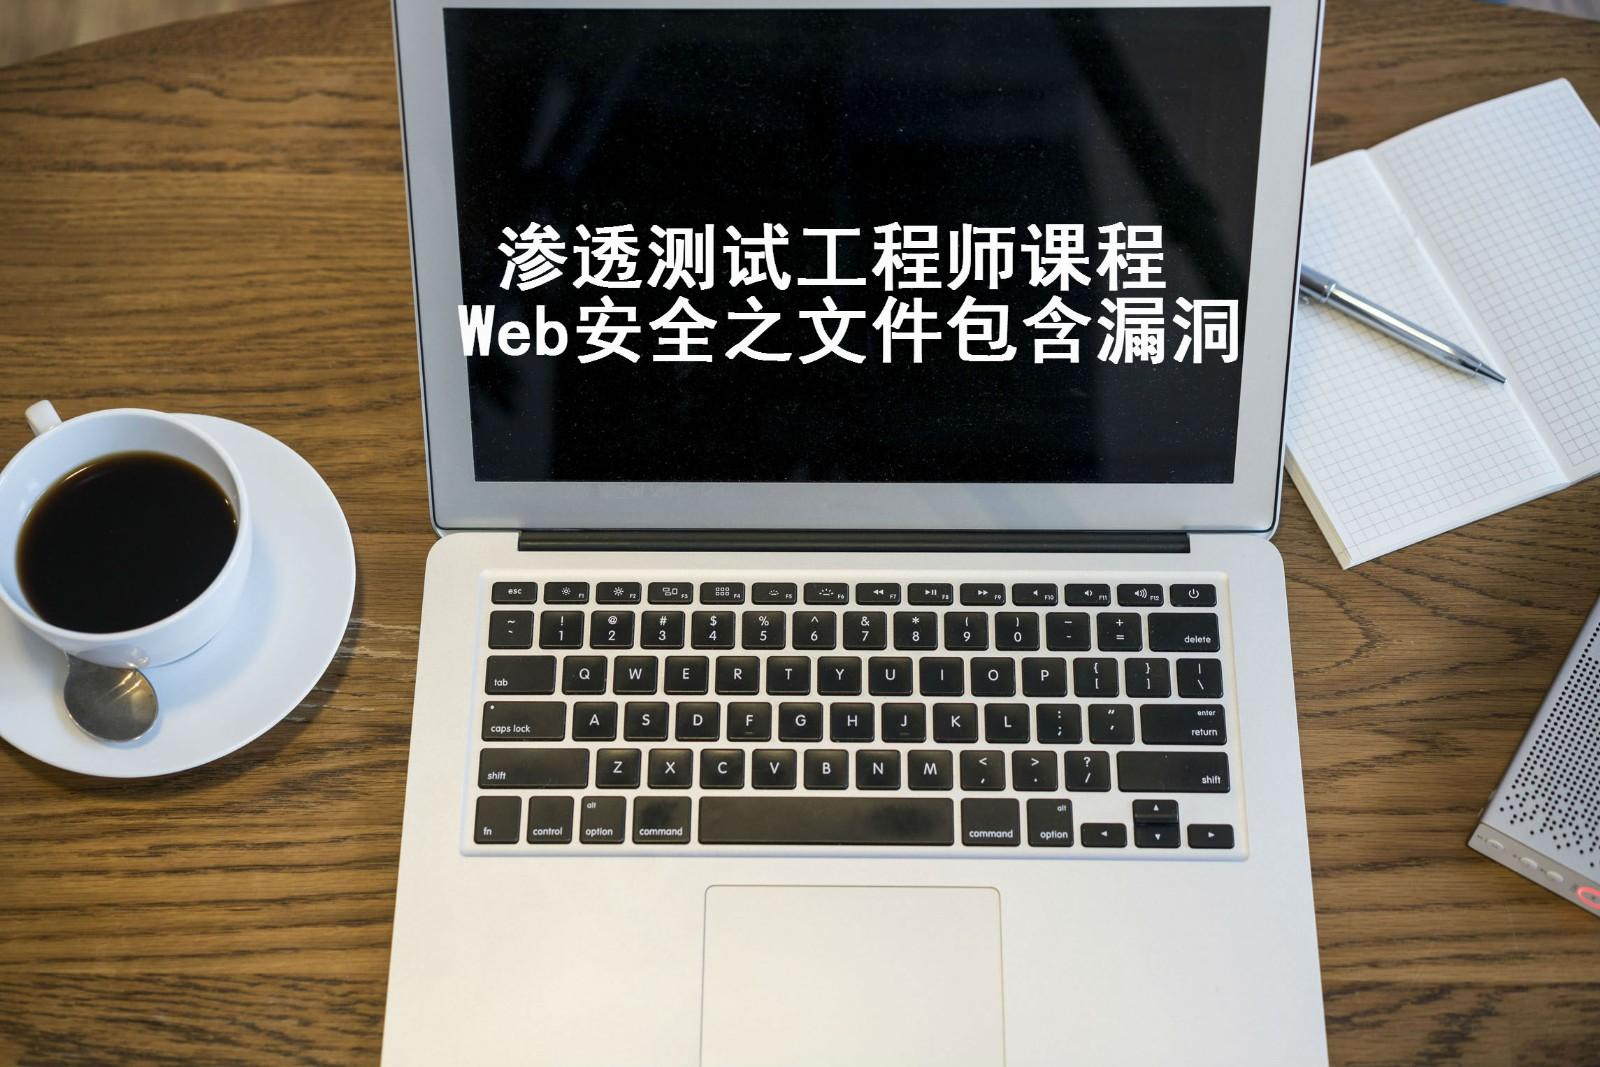 Web文件包含剖析视频教程